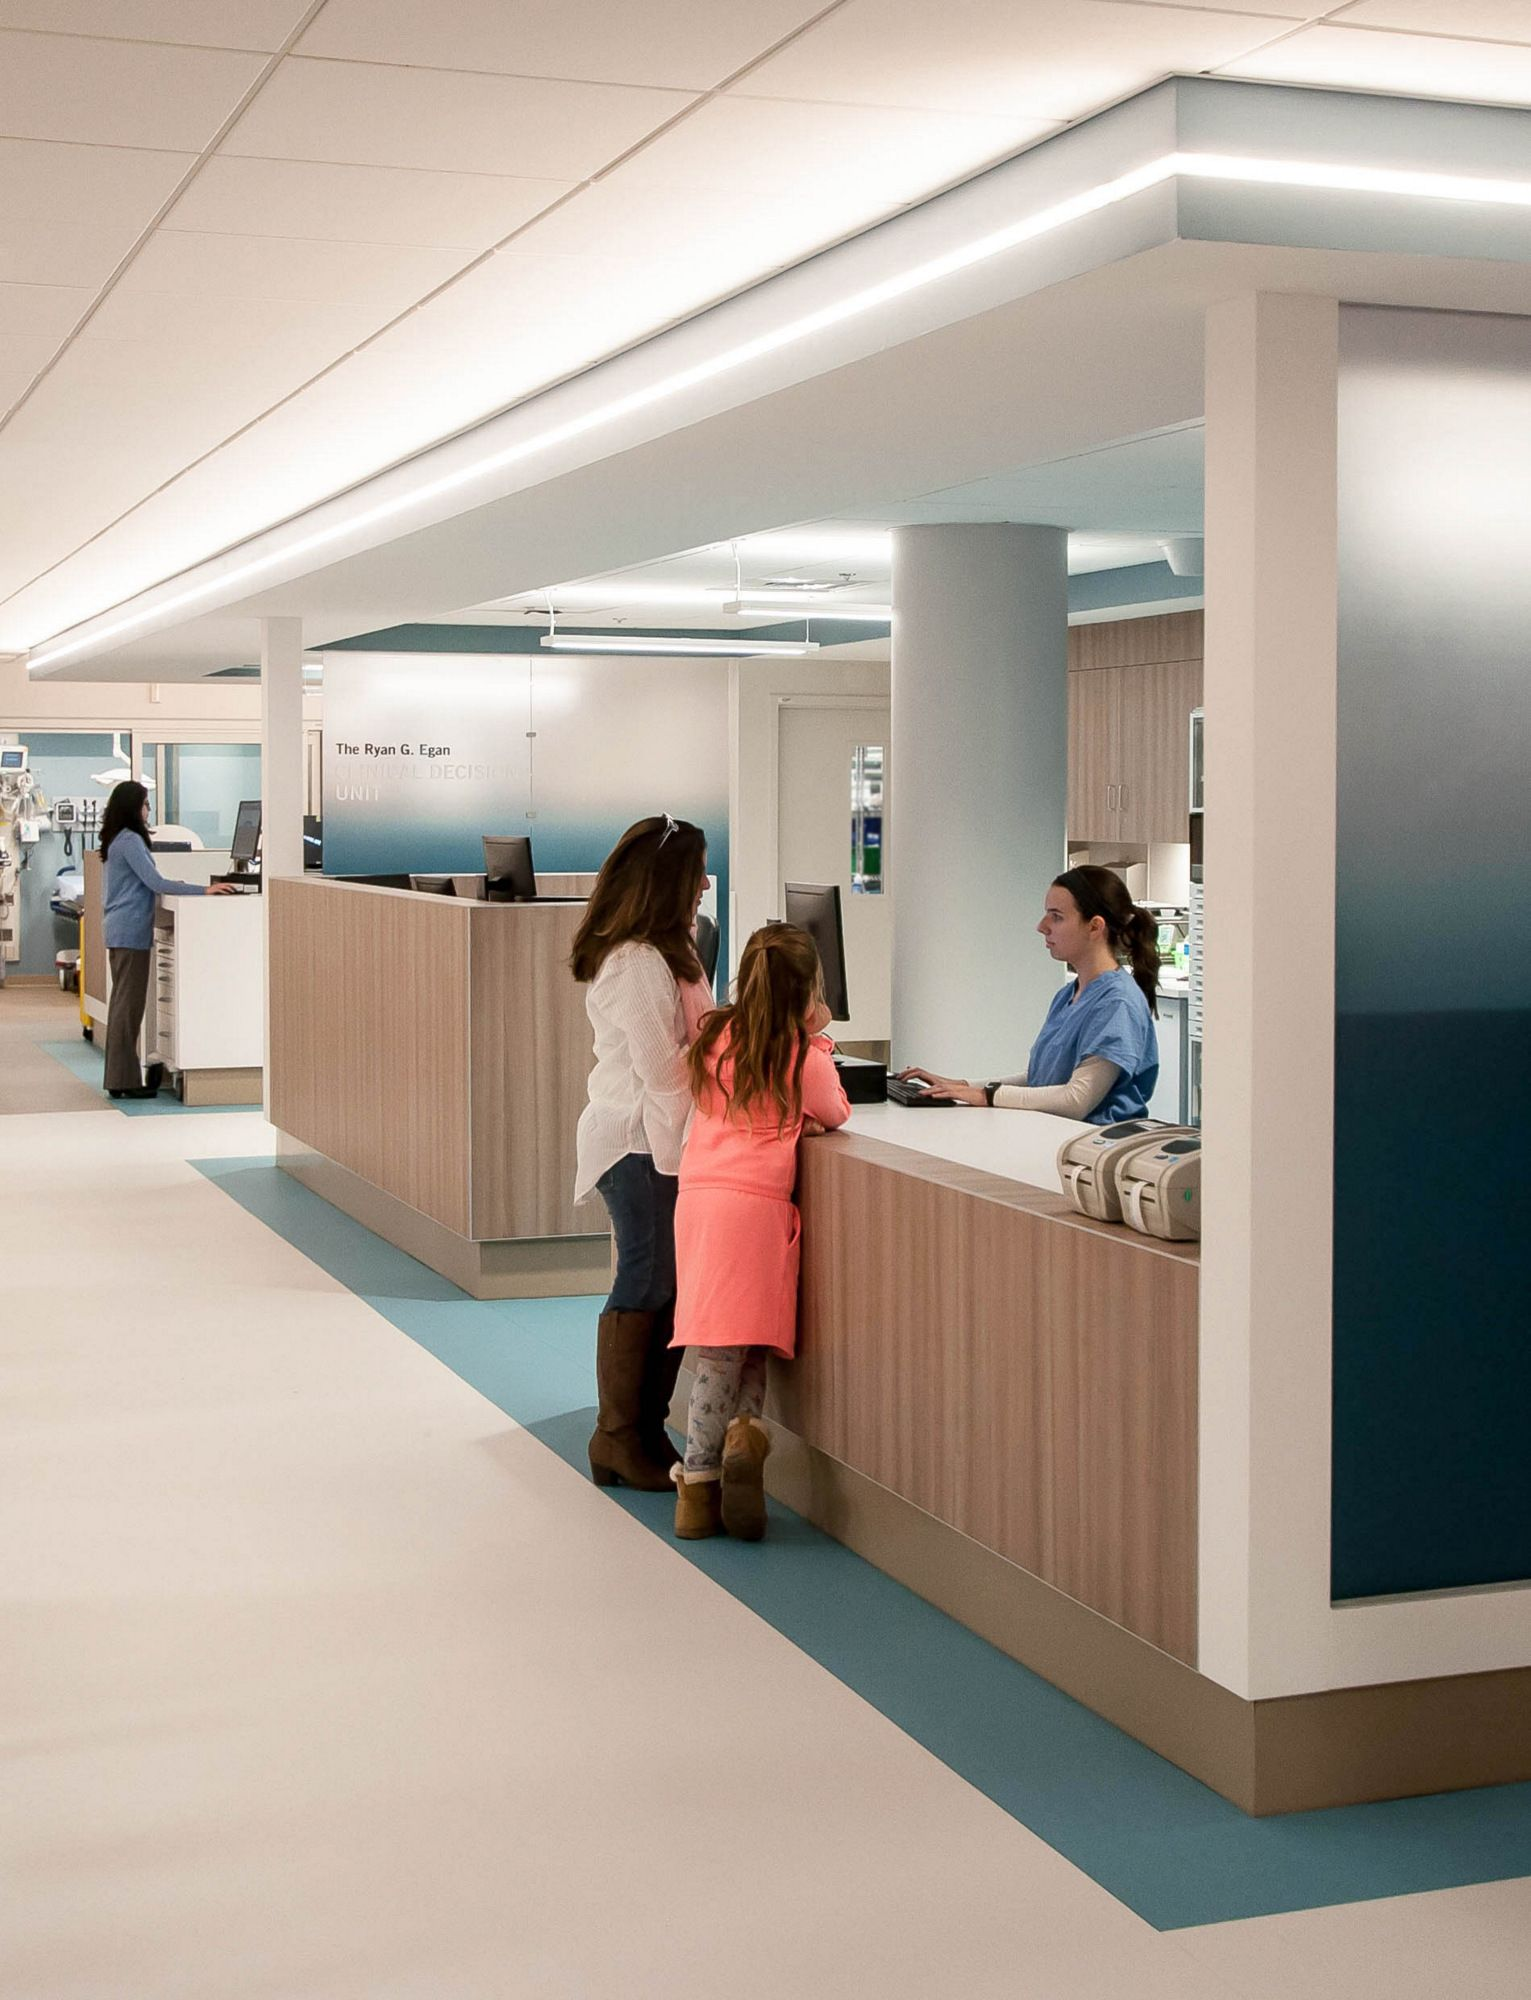 Emergency department of newport hospital in 2020